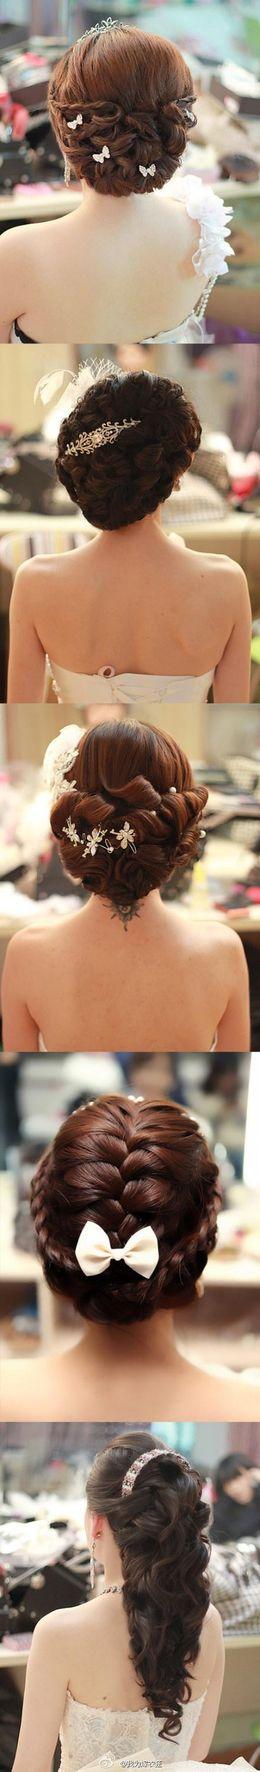 Wedding hair - Weddings